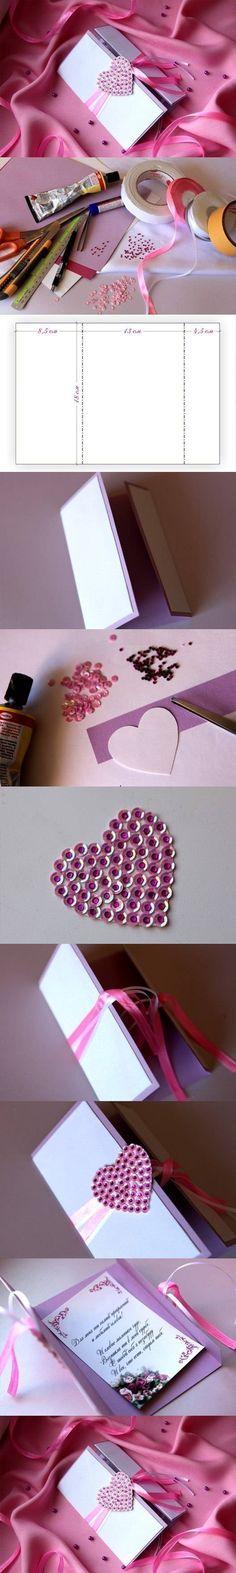 DIY Heart Valentine's Day Card   iCreativeIdeas.com Like Us on Facebook ==> https://www.facebook.com/icreativeideas